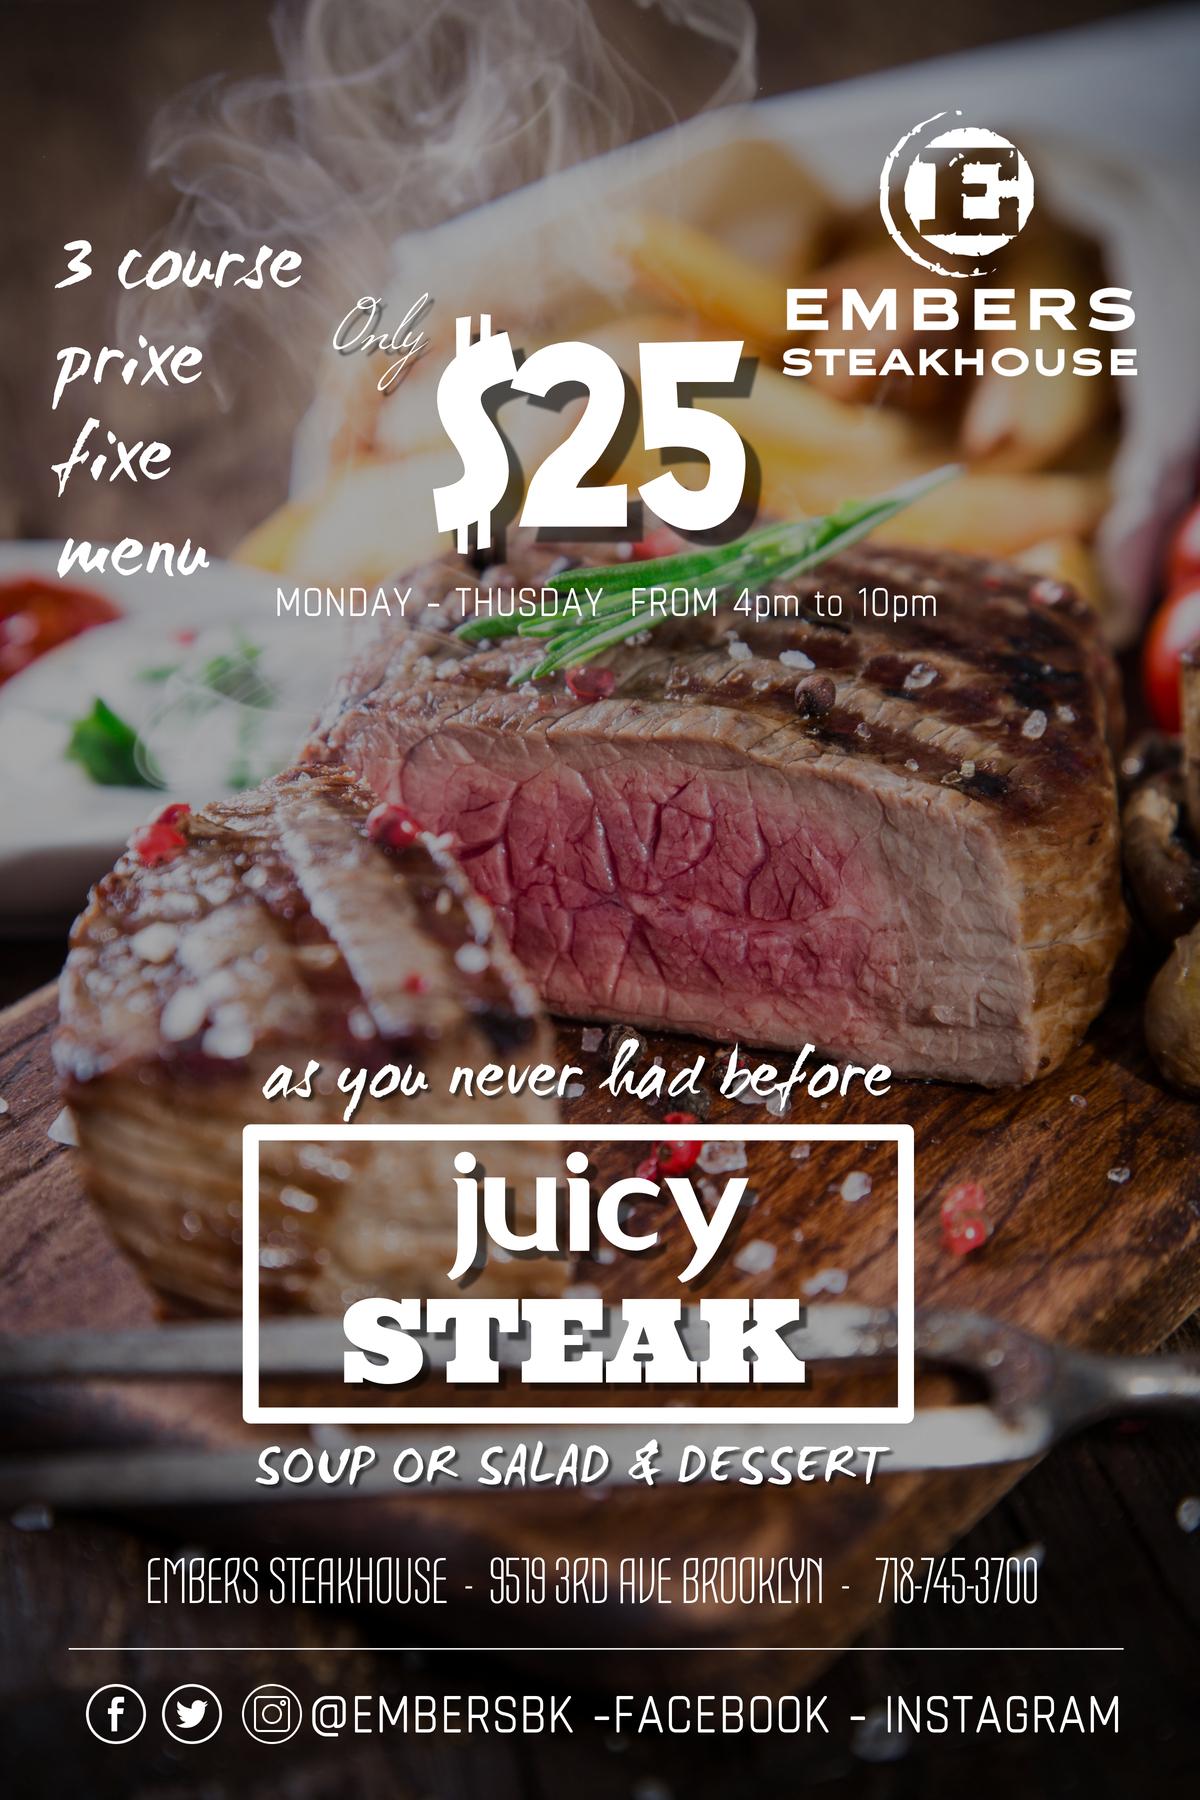 Copy of Steak Fresh Juicy BBQ Offer Poster Flyer.jpg